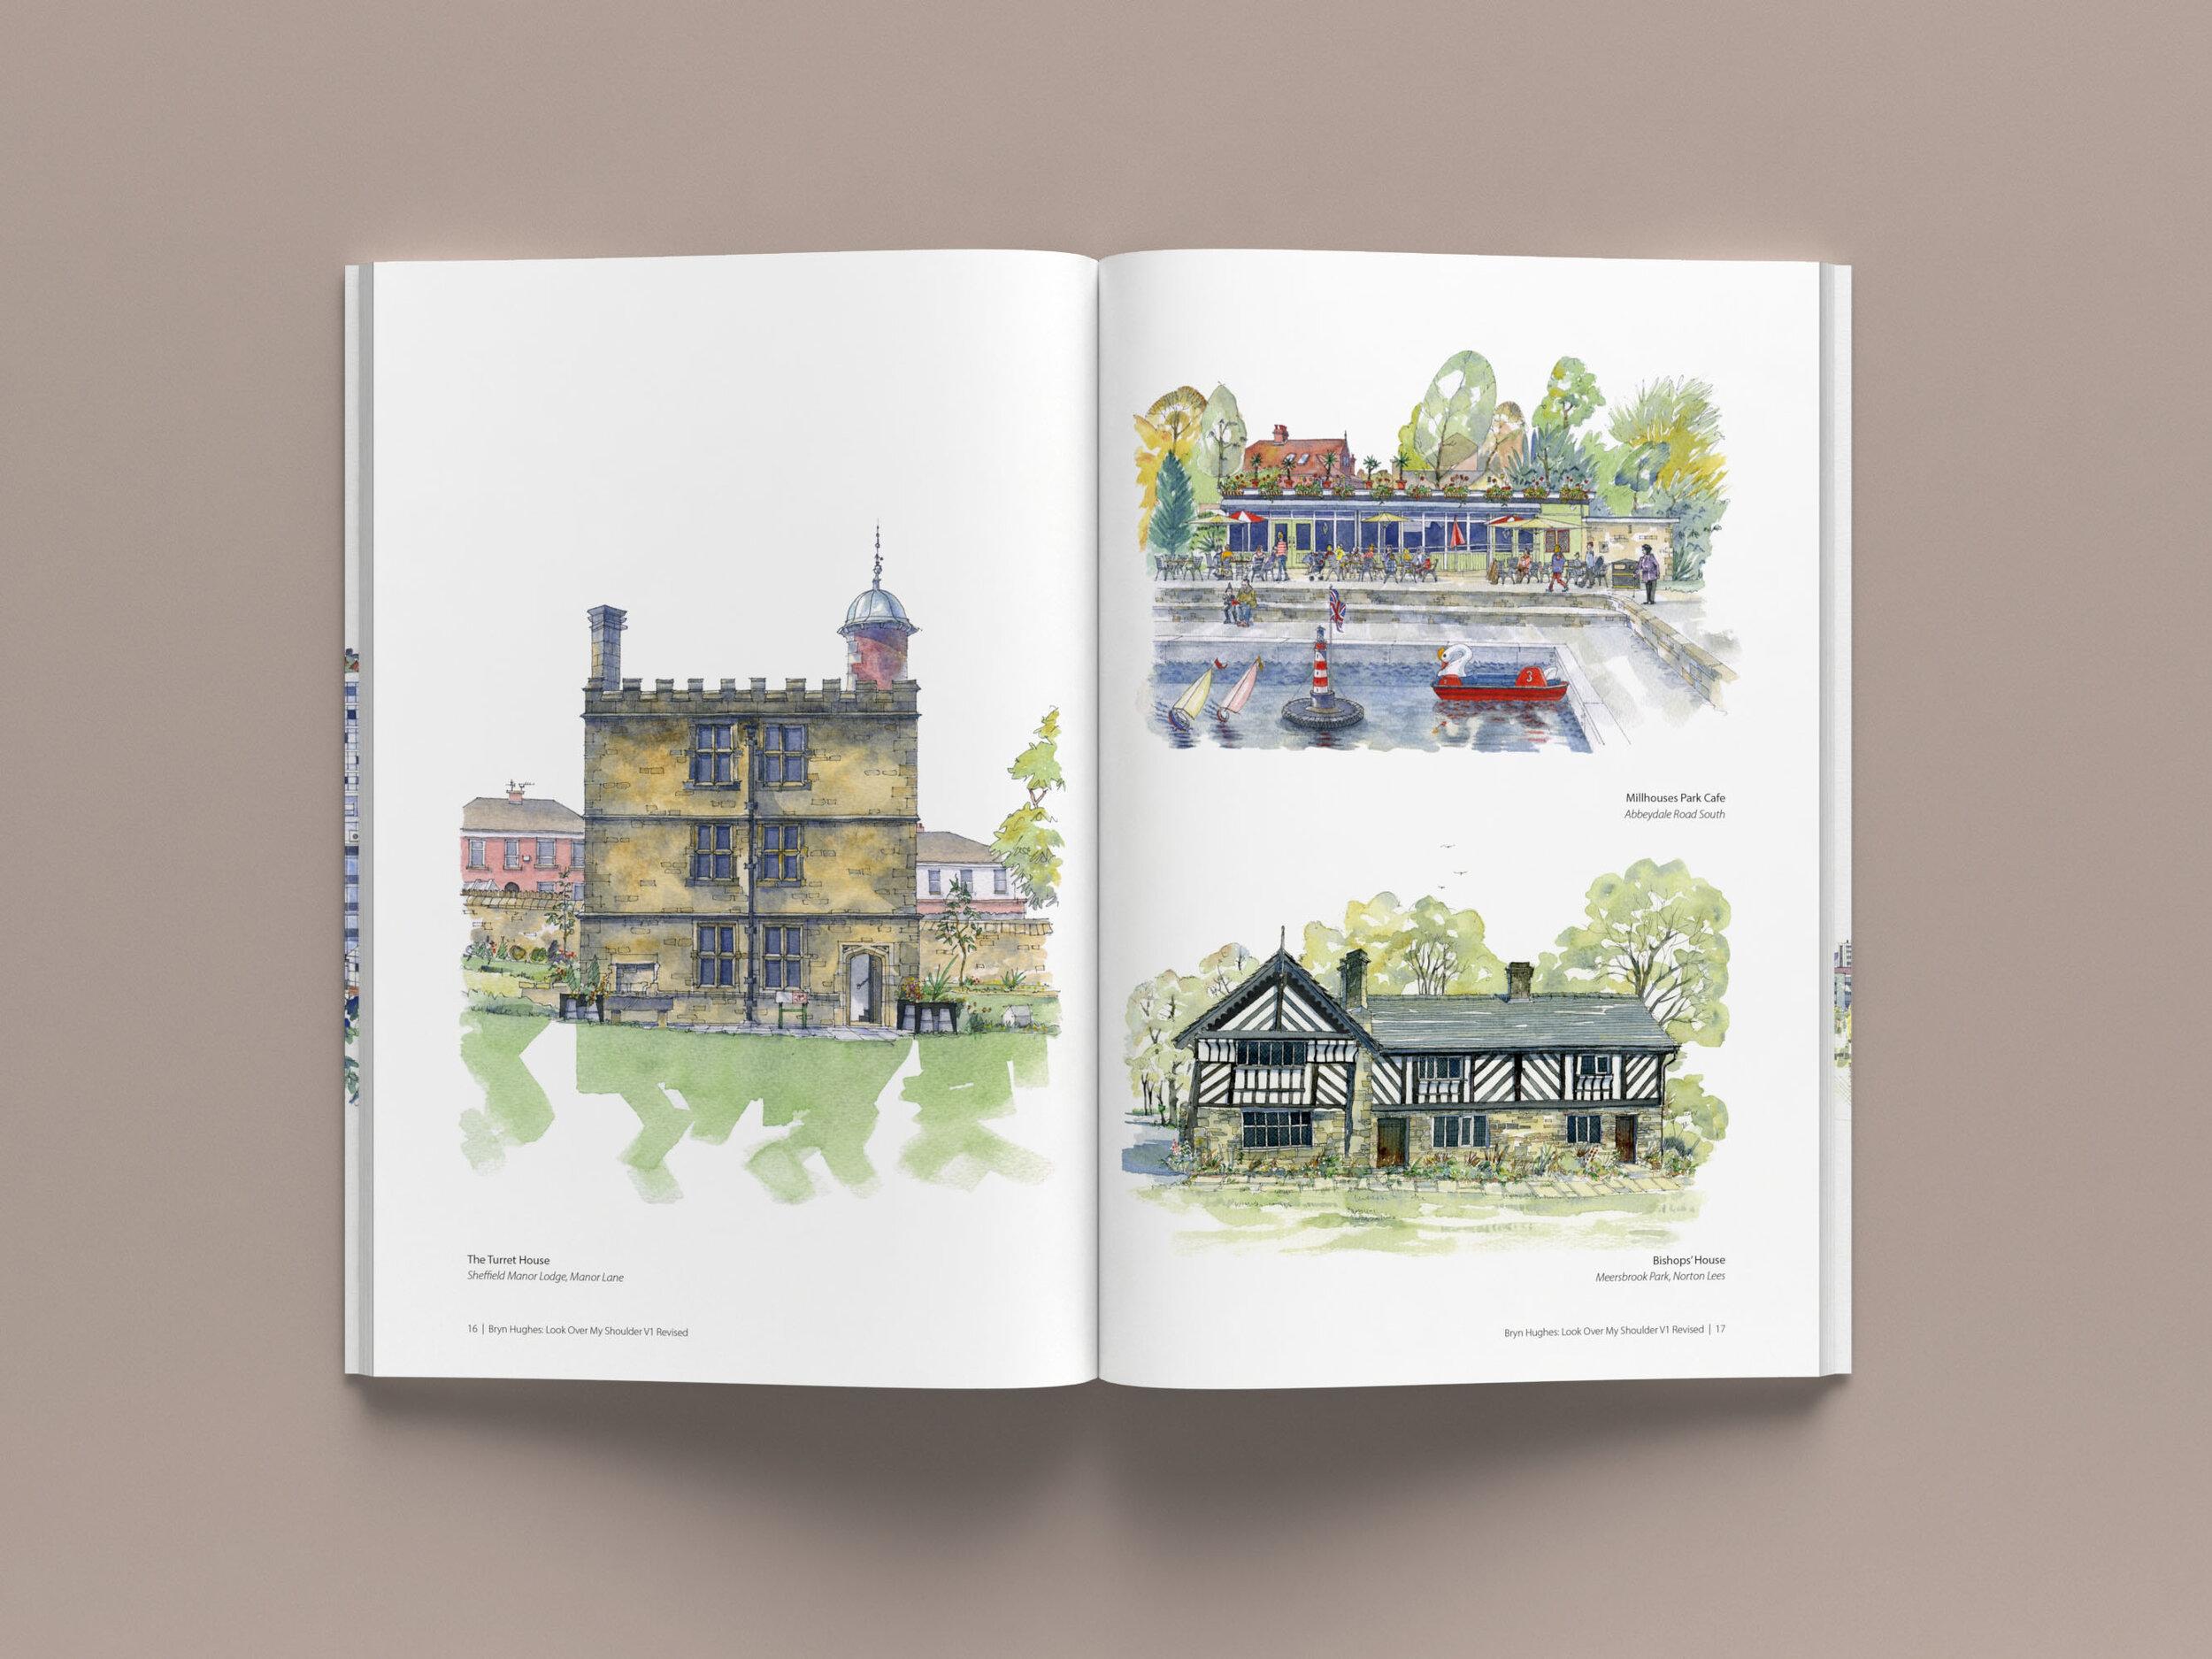 BRYN-HUGHES-ARTIST-SOFTBACK-BOOK02-B-_0033_Group 9.jpg